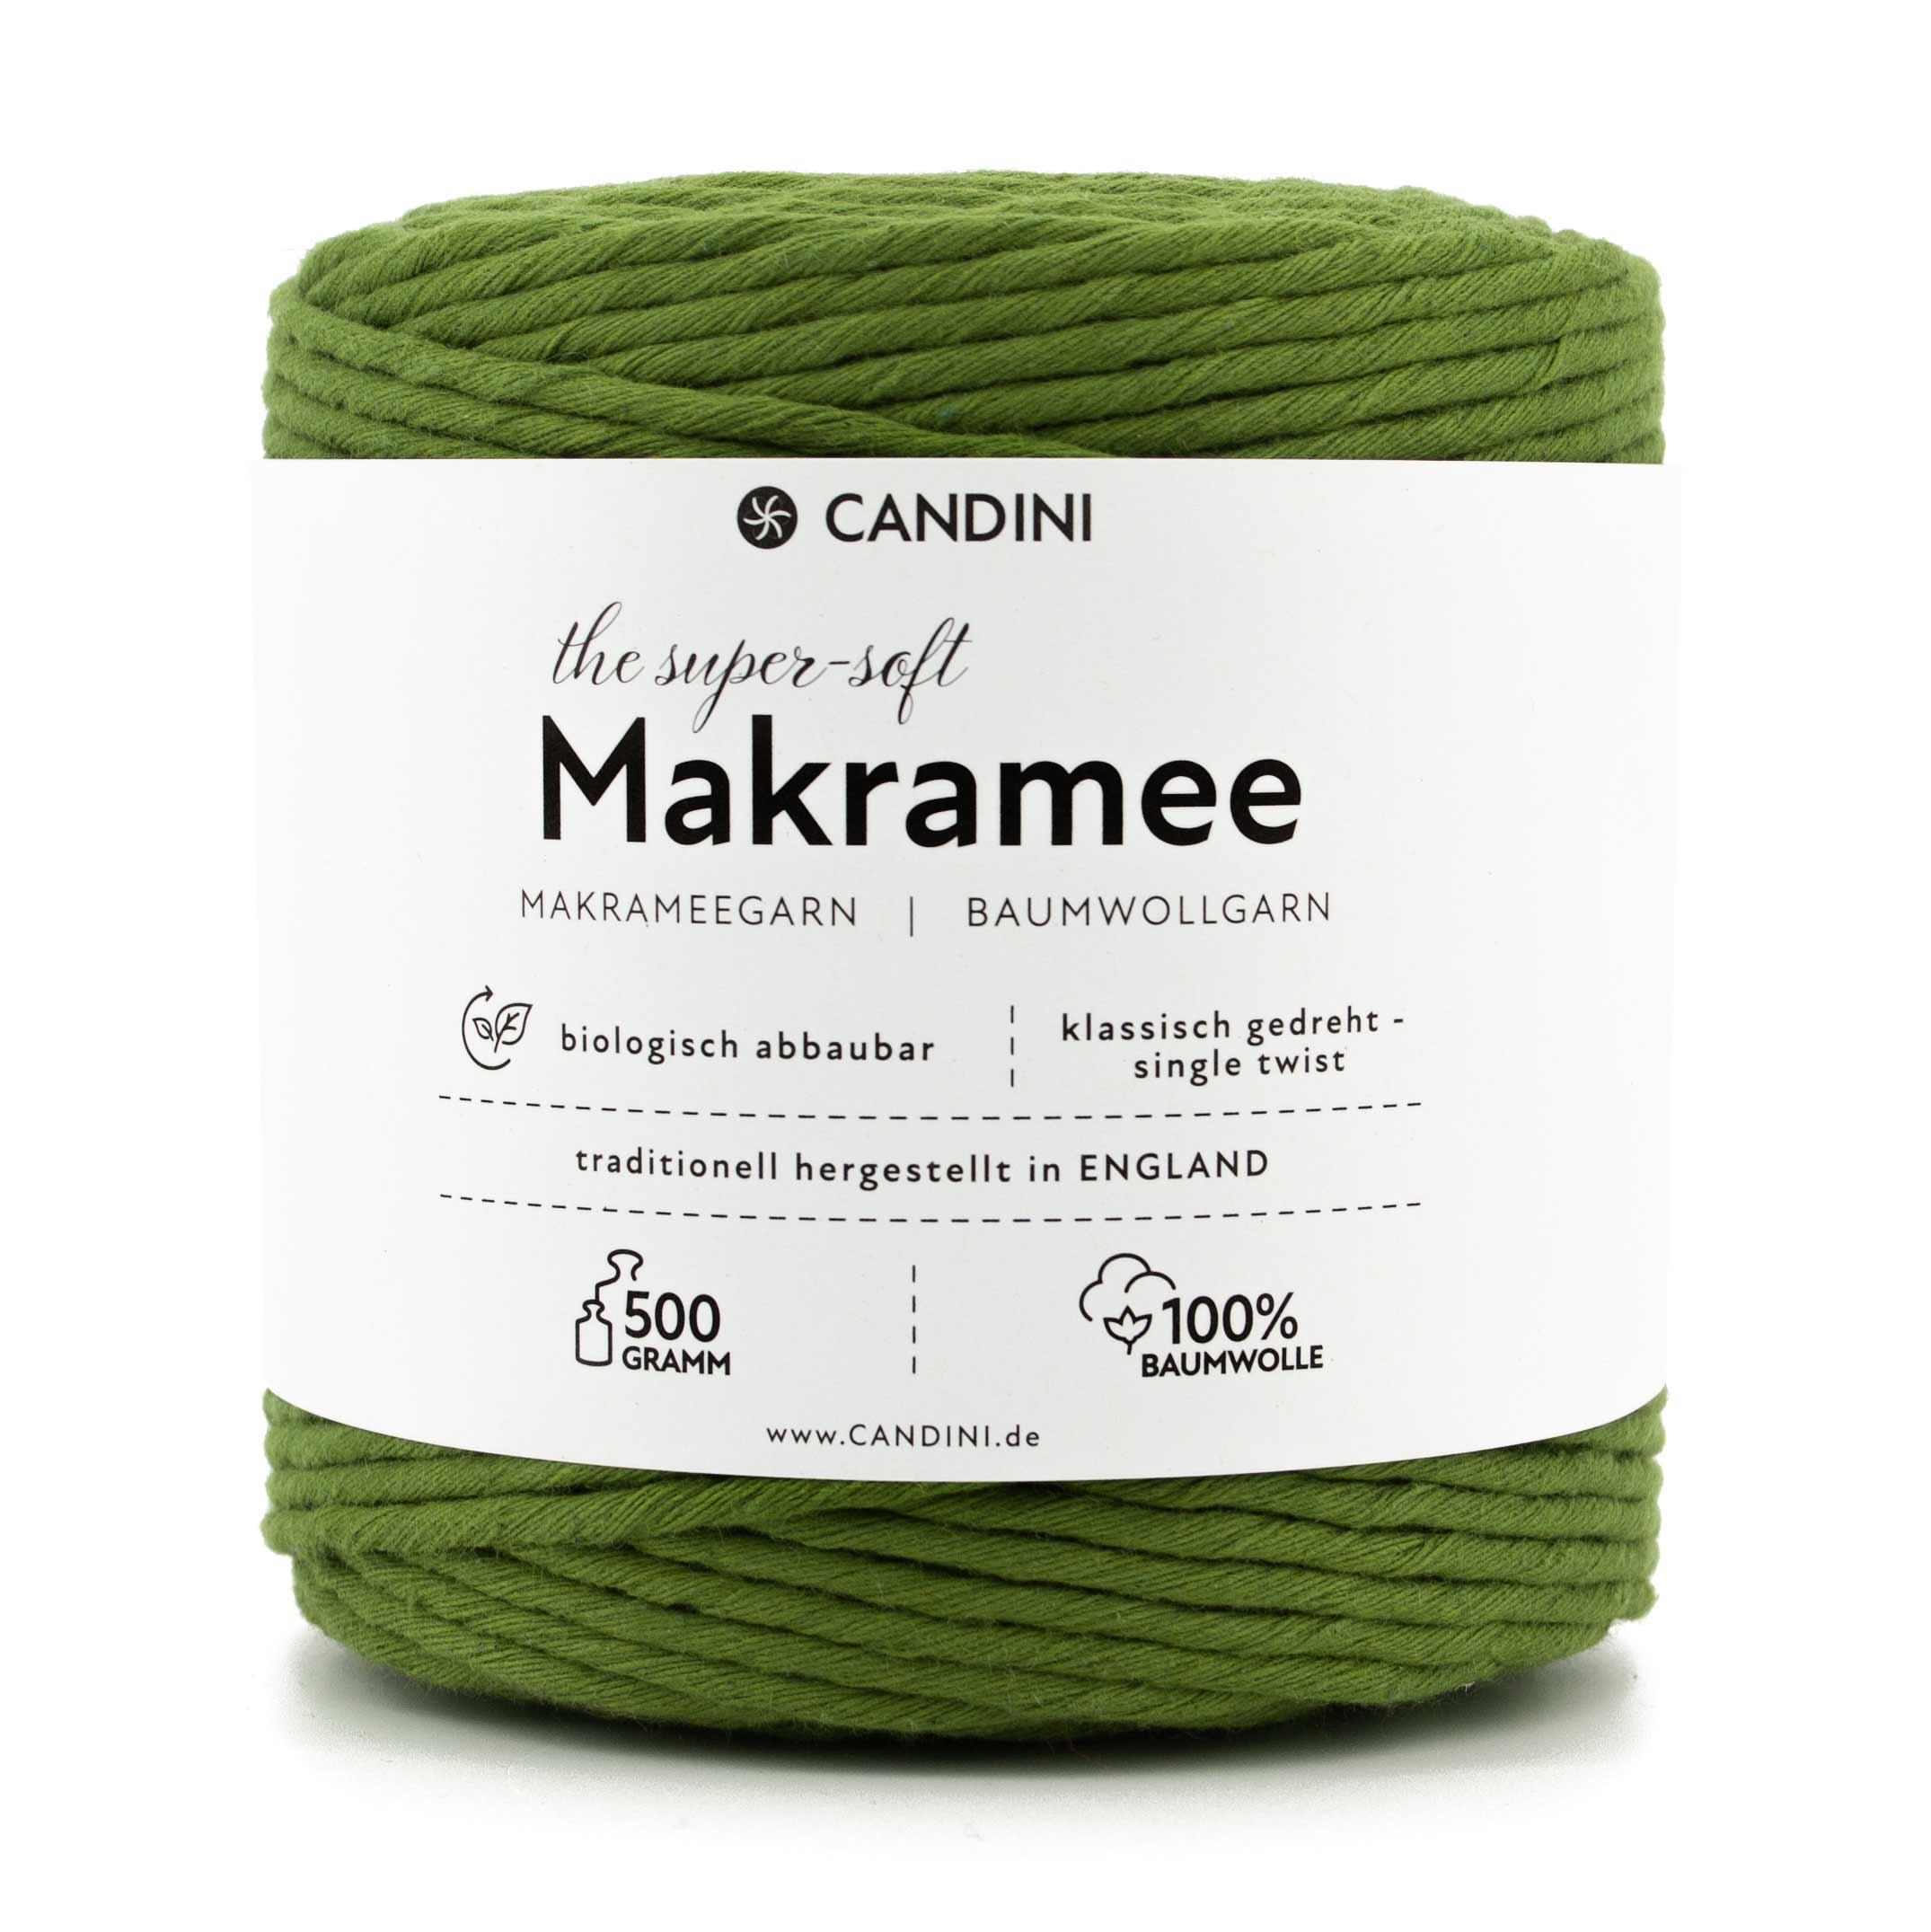 makramee-limette_banderole